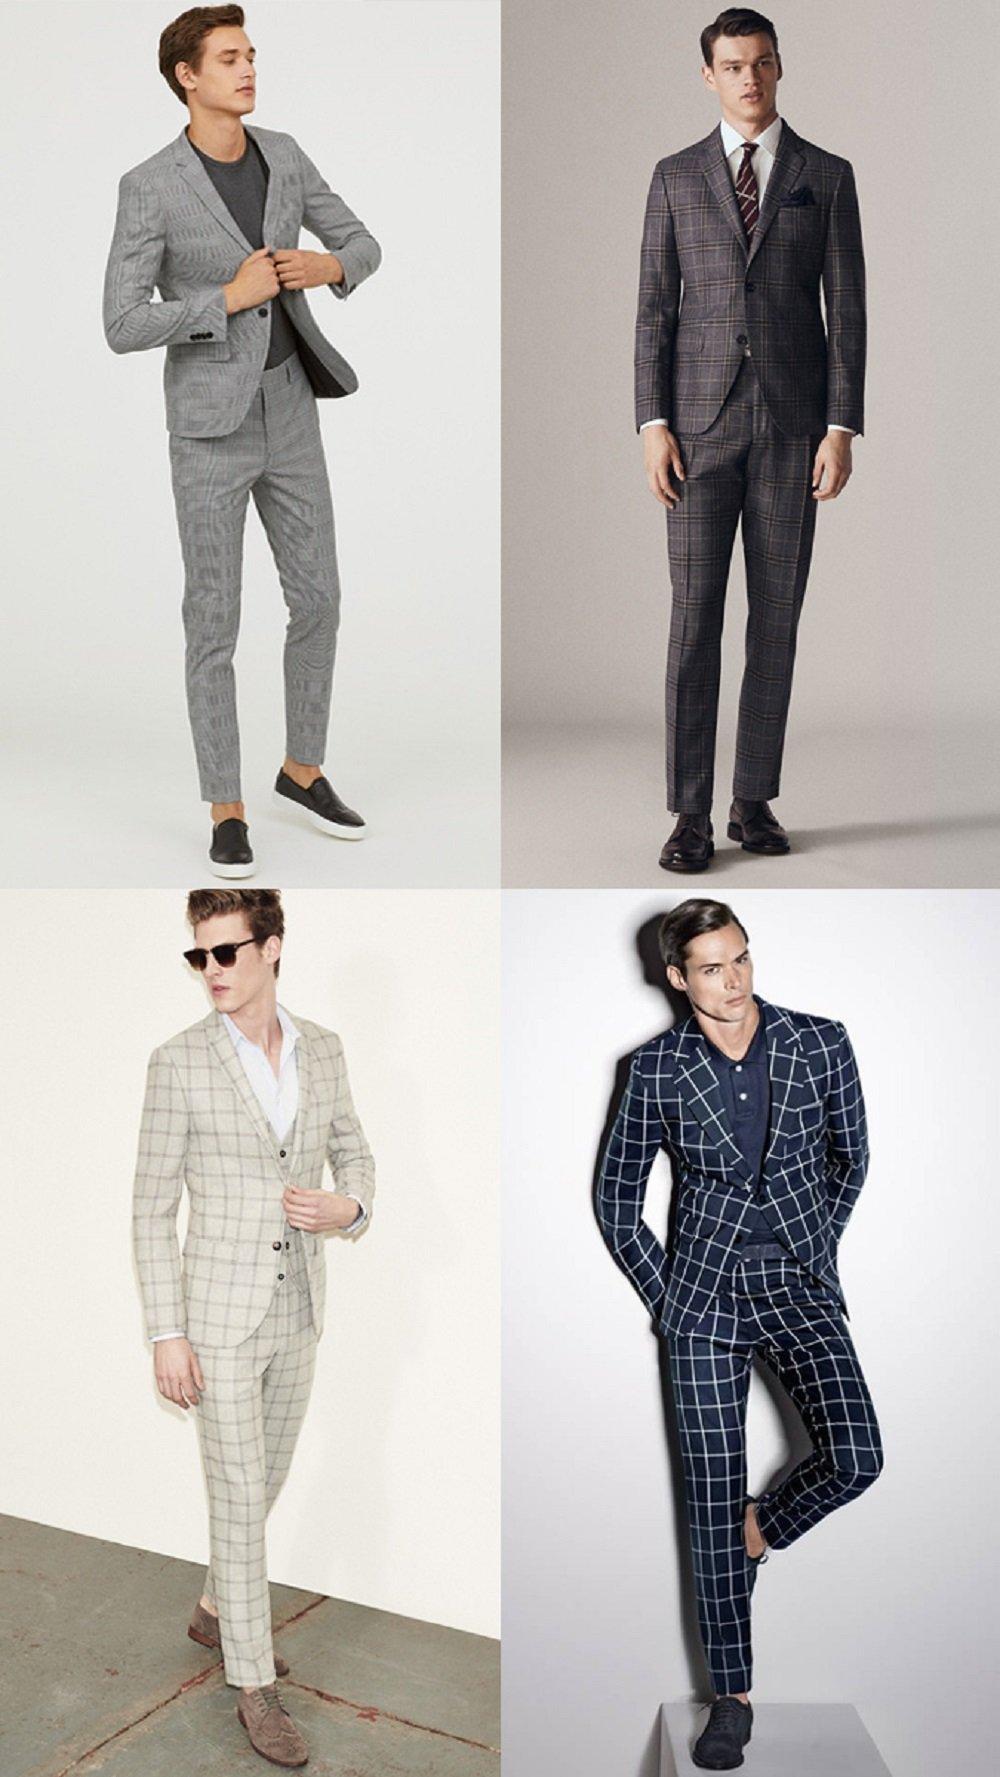 6-_lbdl-_lrjly-_lkrwht_-_check-_suit